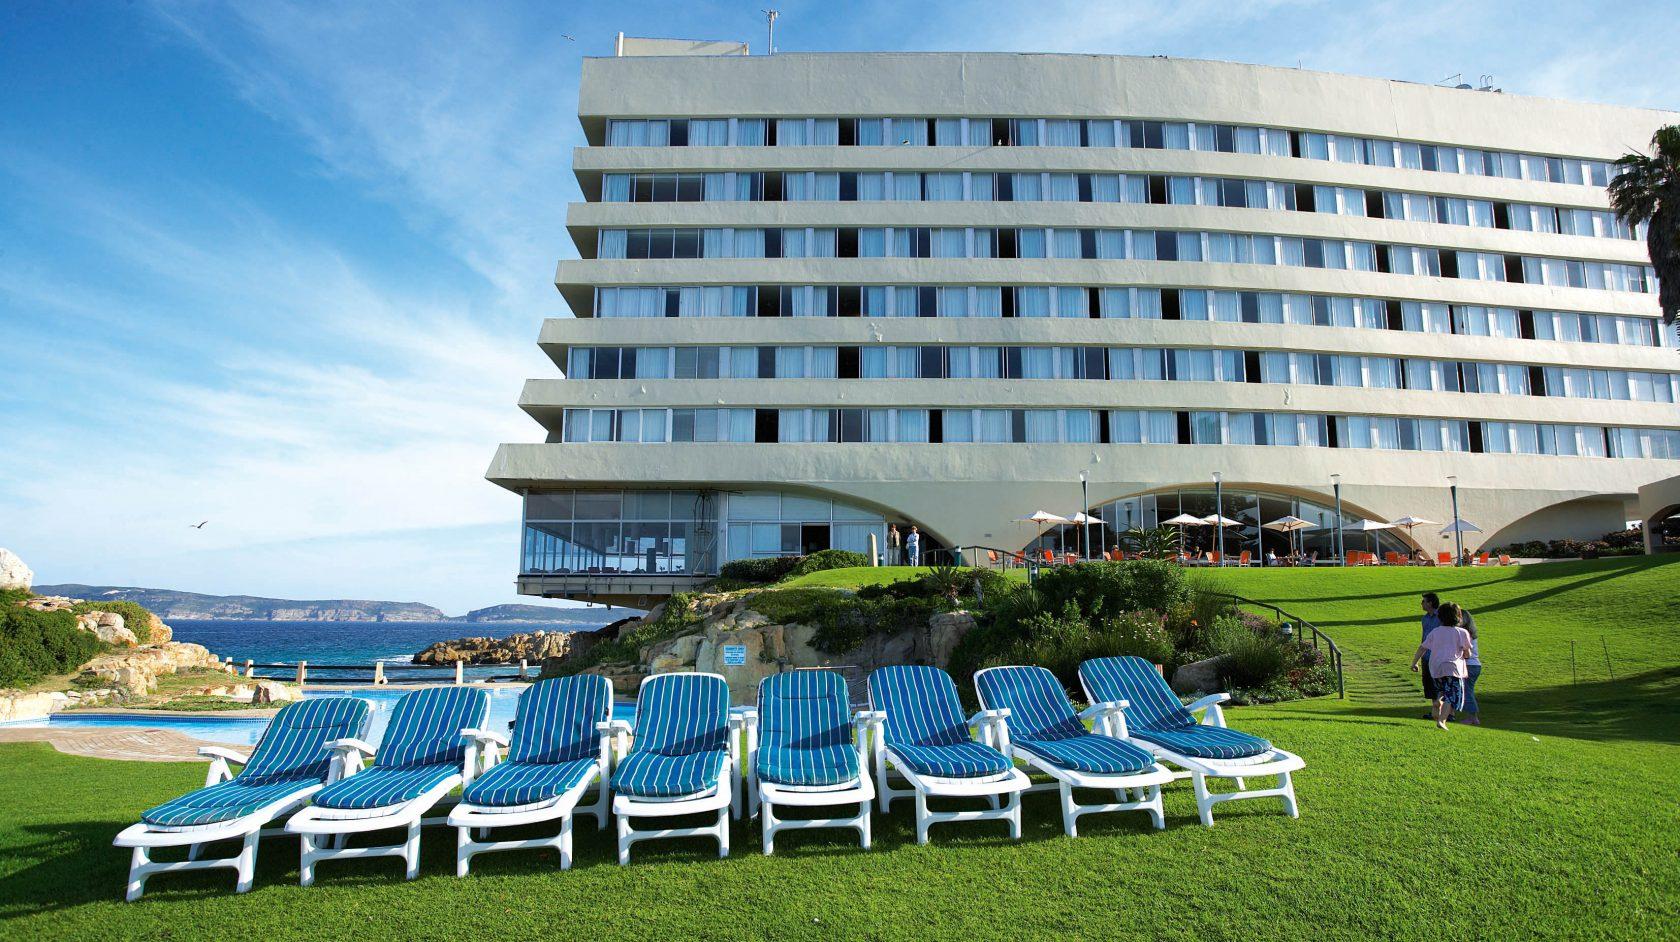 Beacon Island Hotel